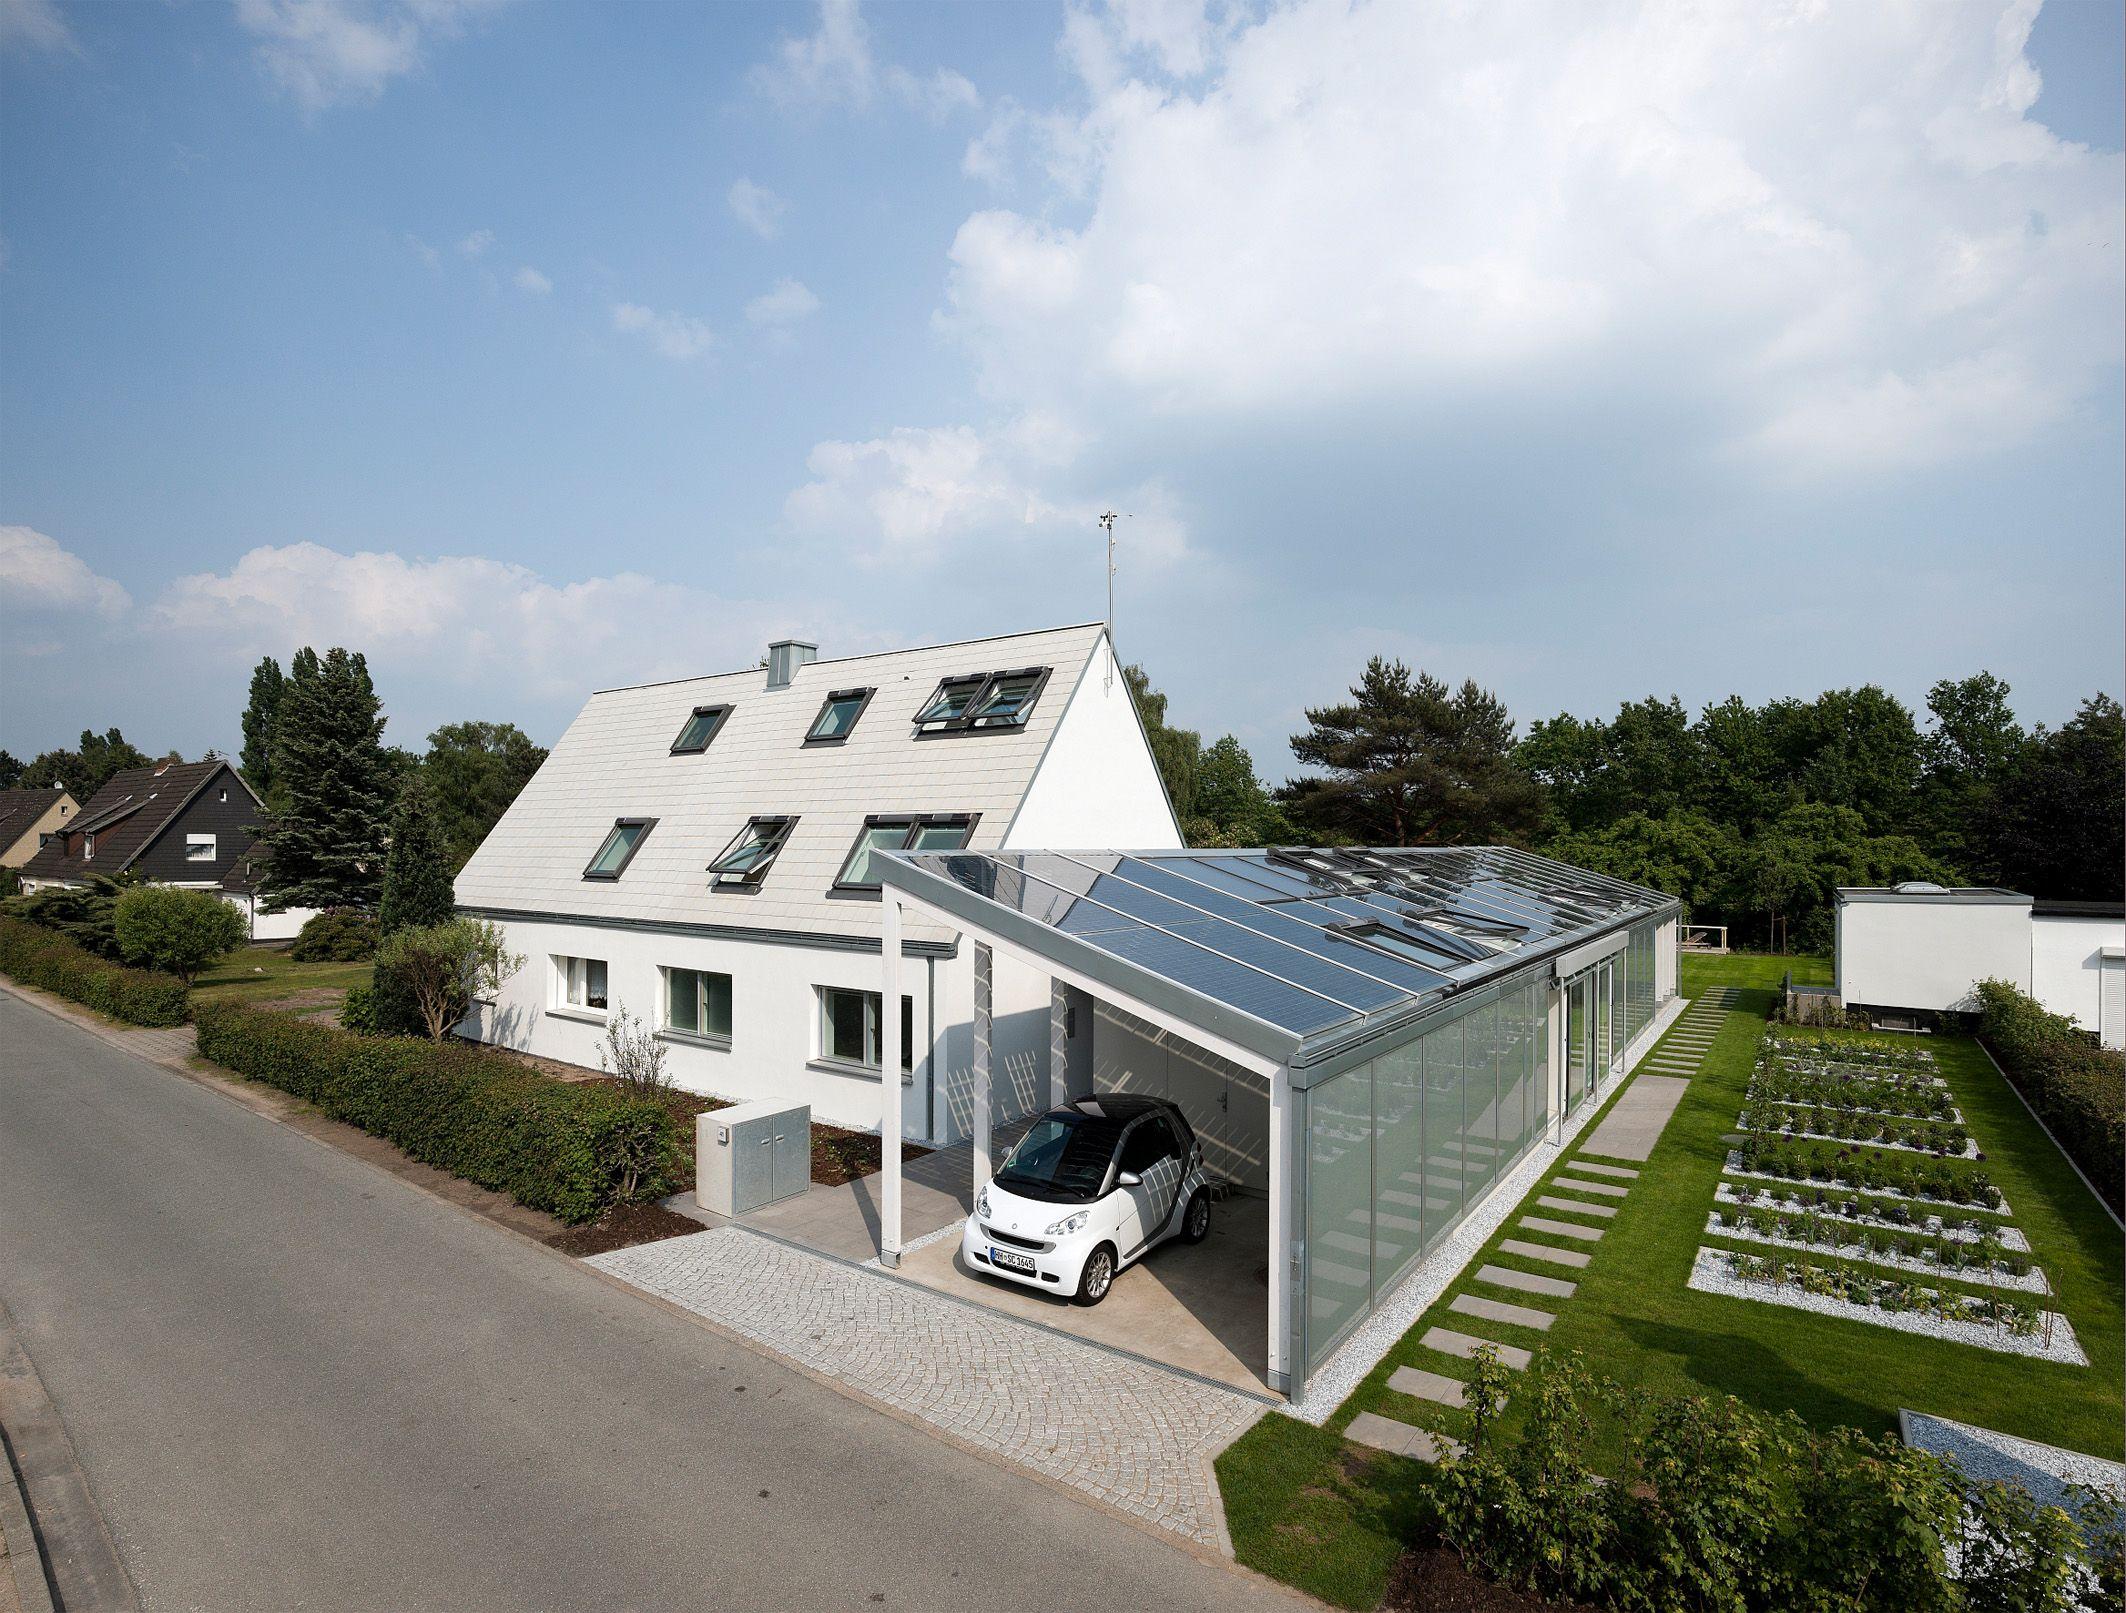 White House With White Attic Solar Panels Http://openbuildings.com/buildings